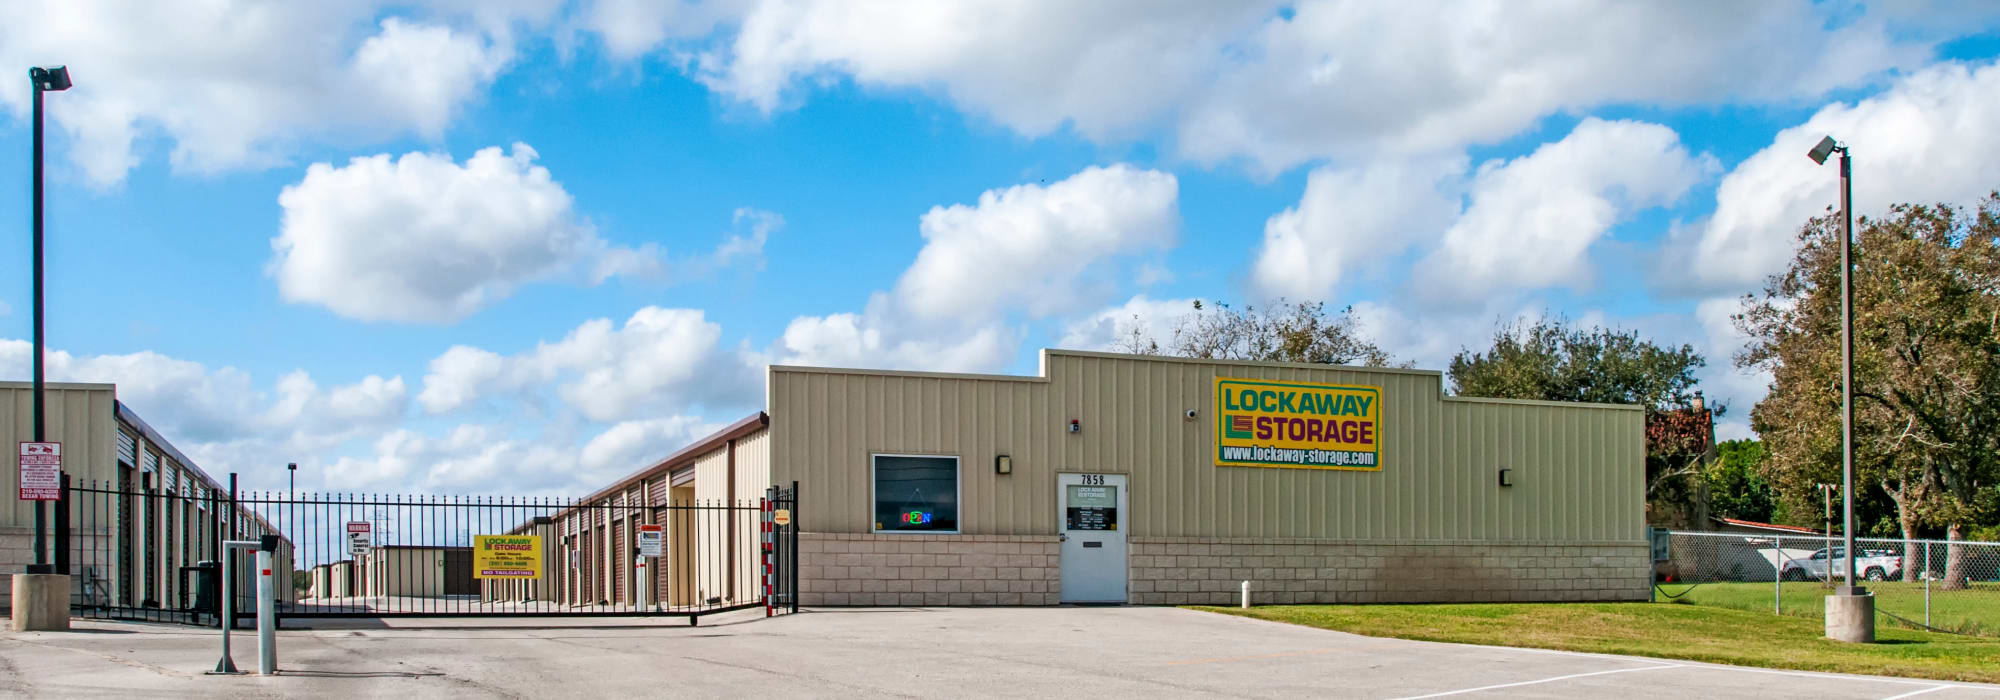 Self storage at Lockaway Storage in San Antonio, Texas